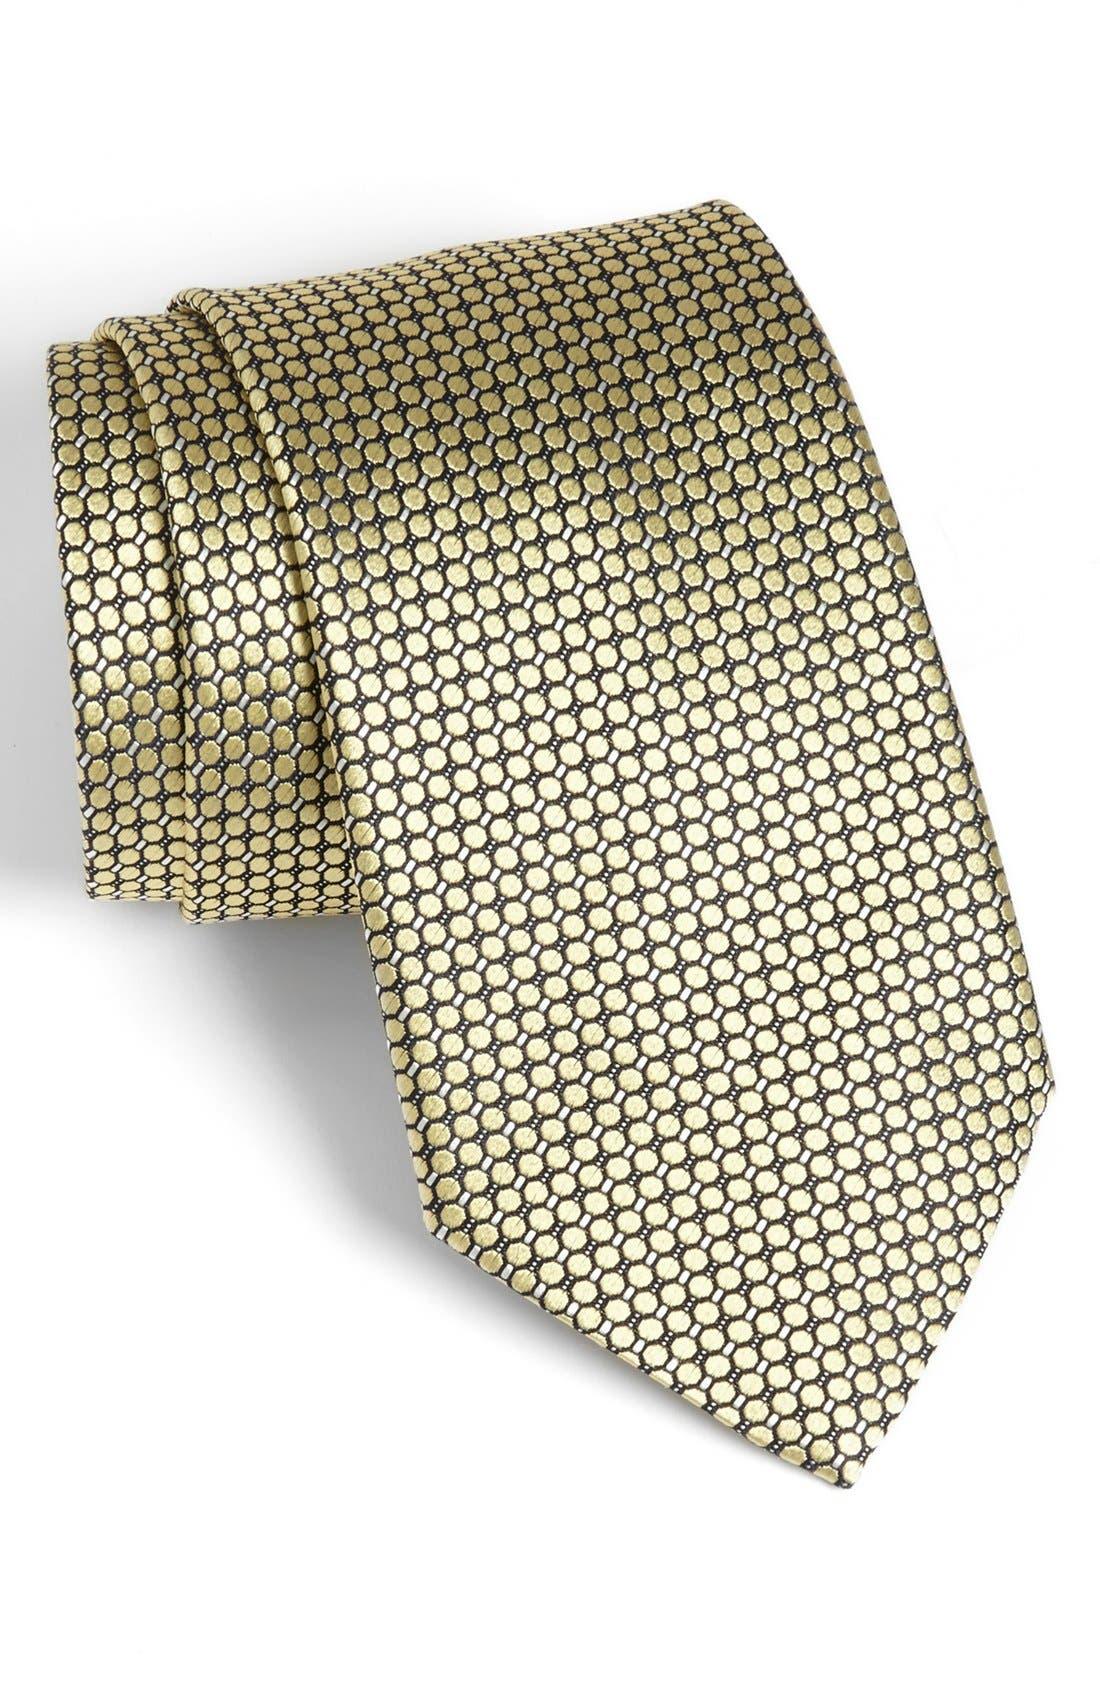 Alternate Image 1 Selected - Ermenegildo Zegna Solid Circle Grid Woven Silk Tie